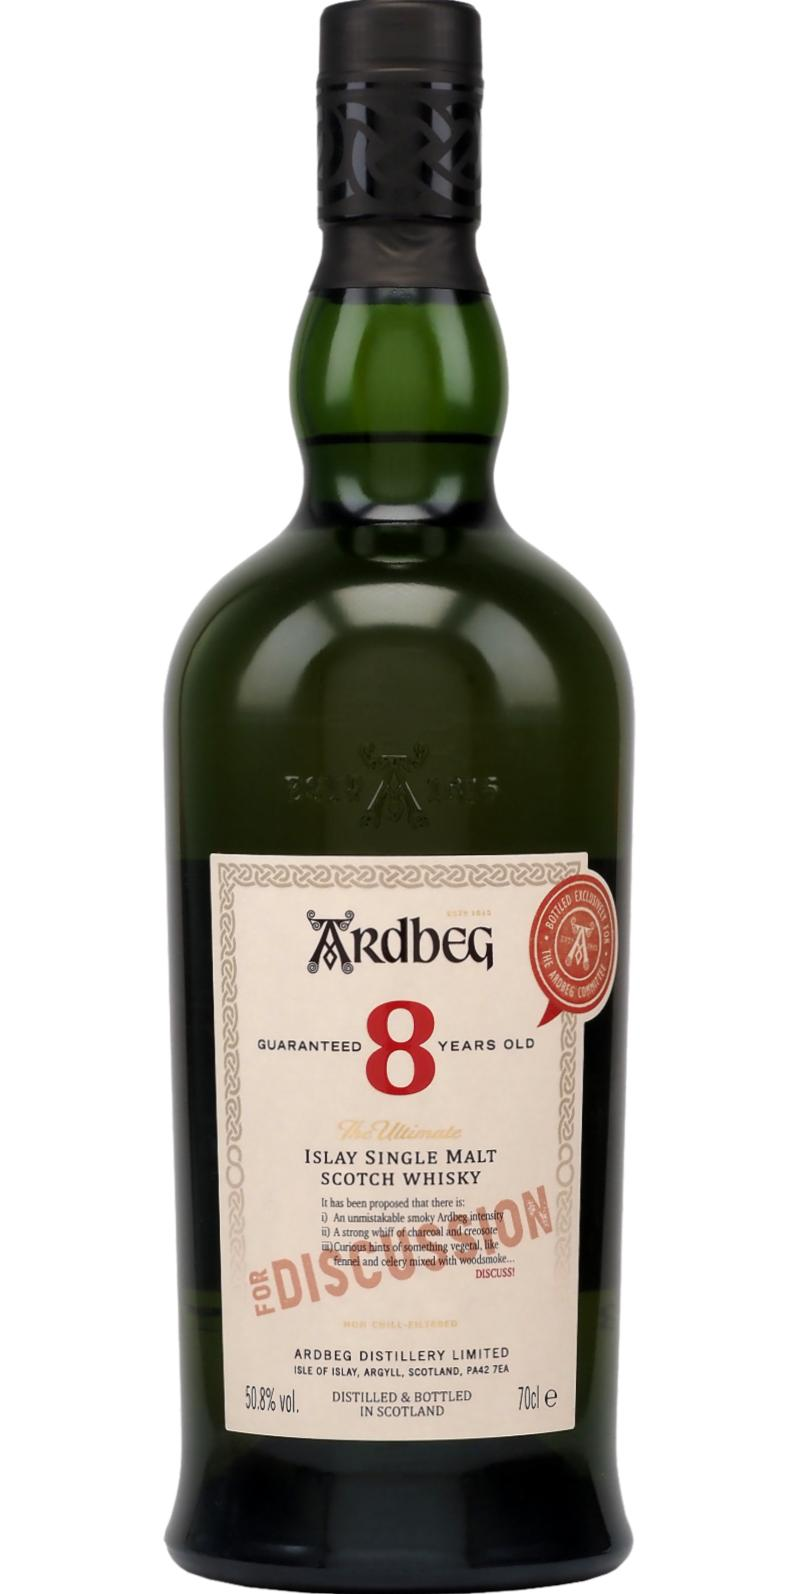 Ardbeg 08-year-old